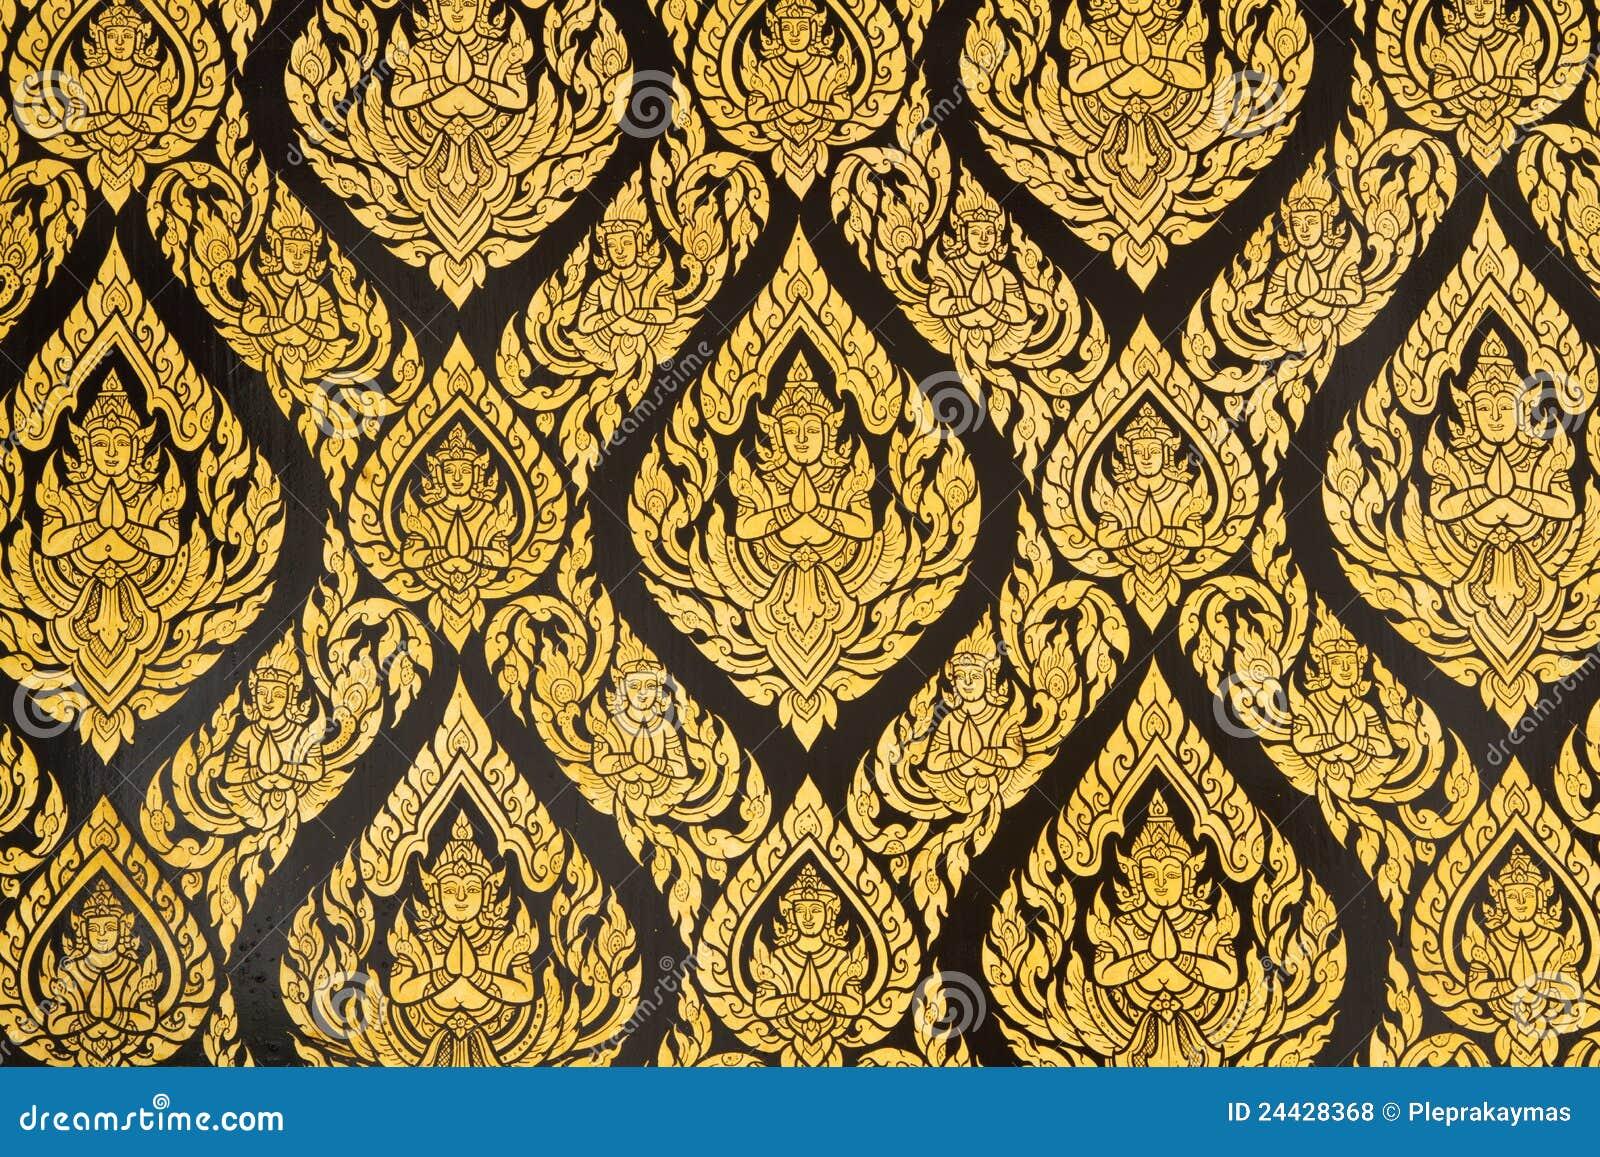 Tailand Art And Craft